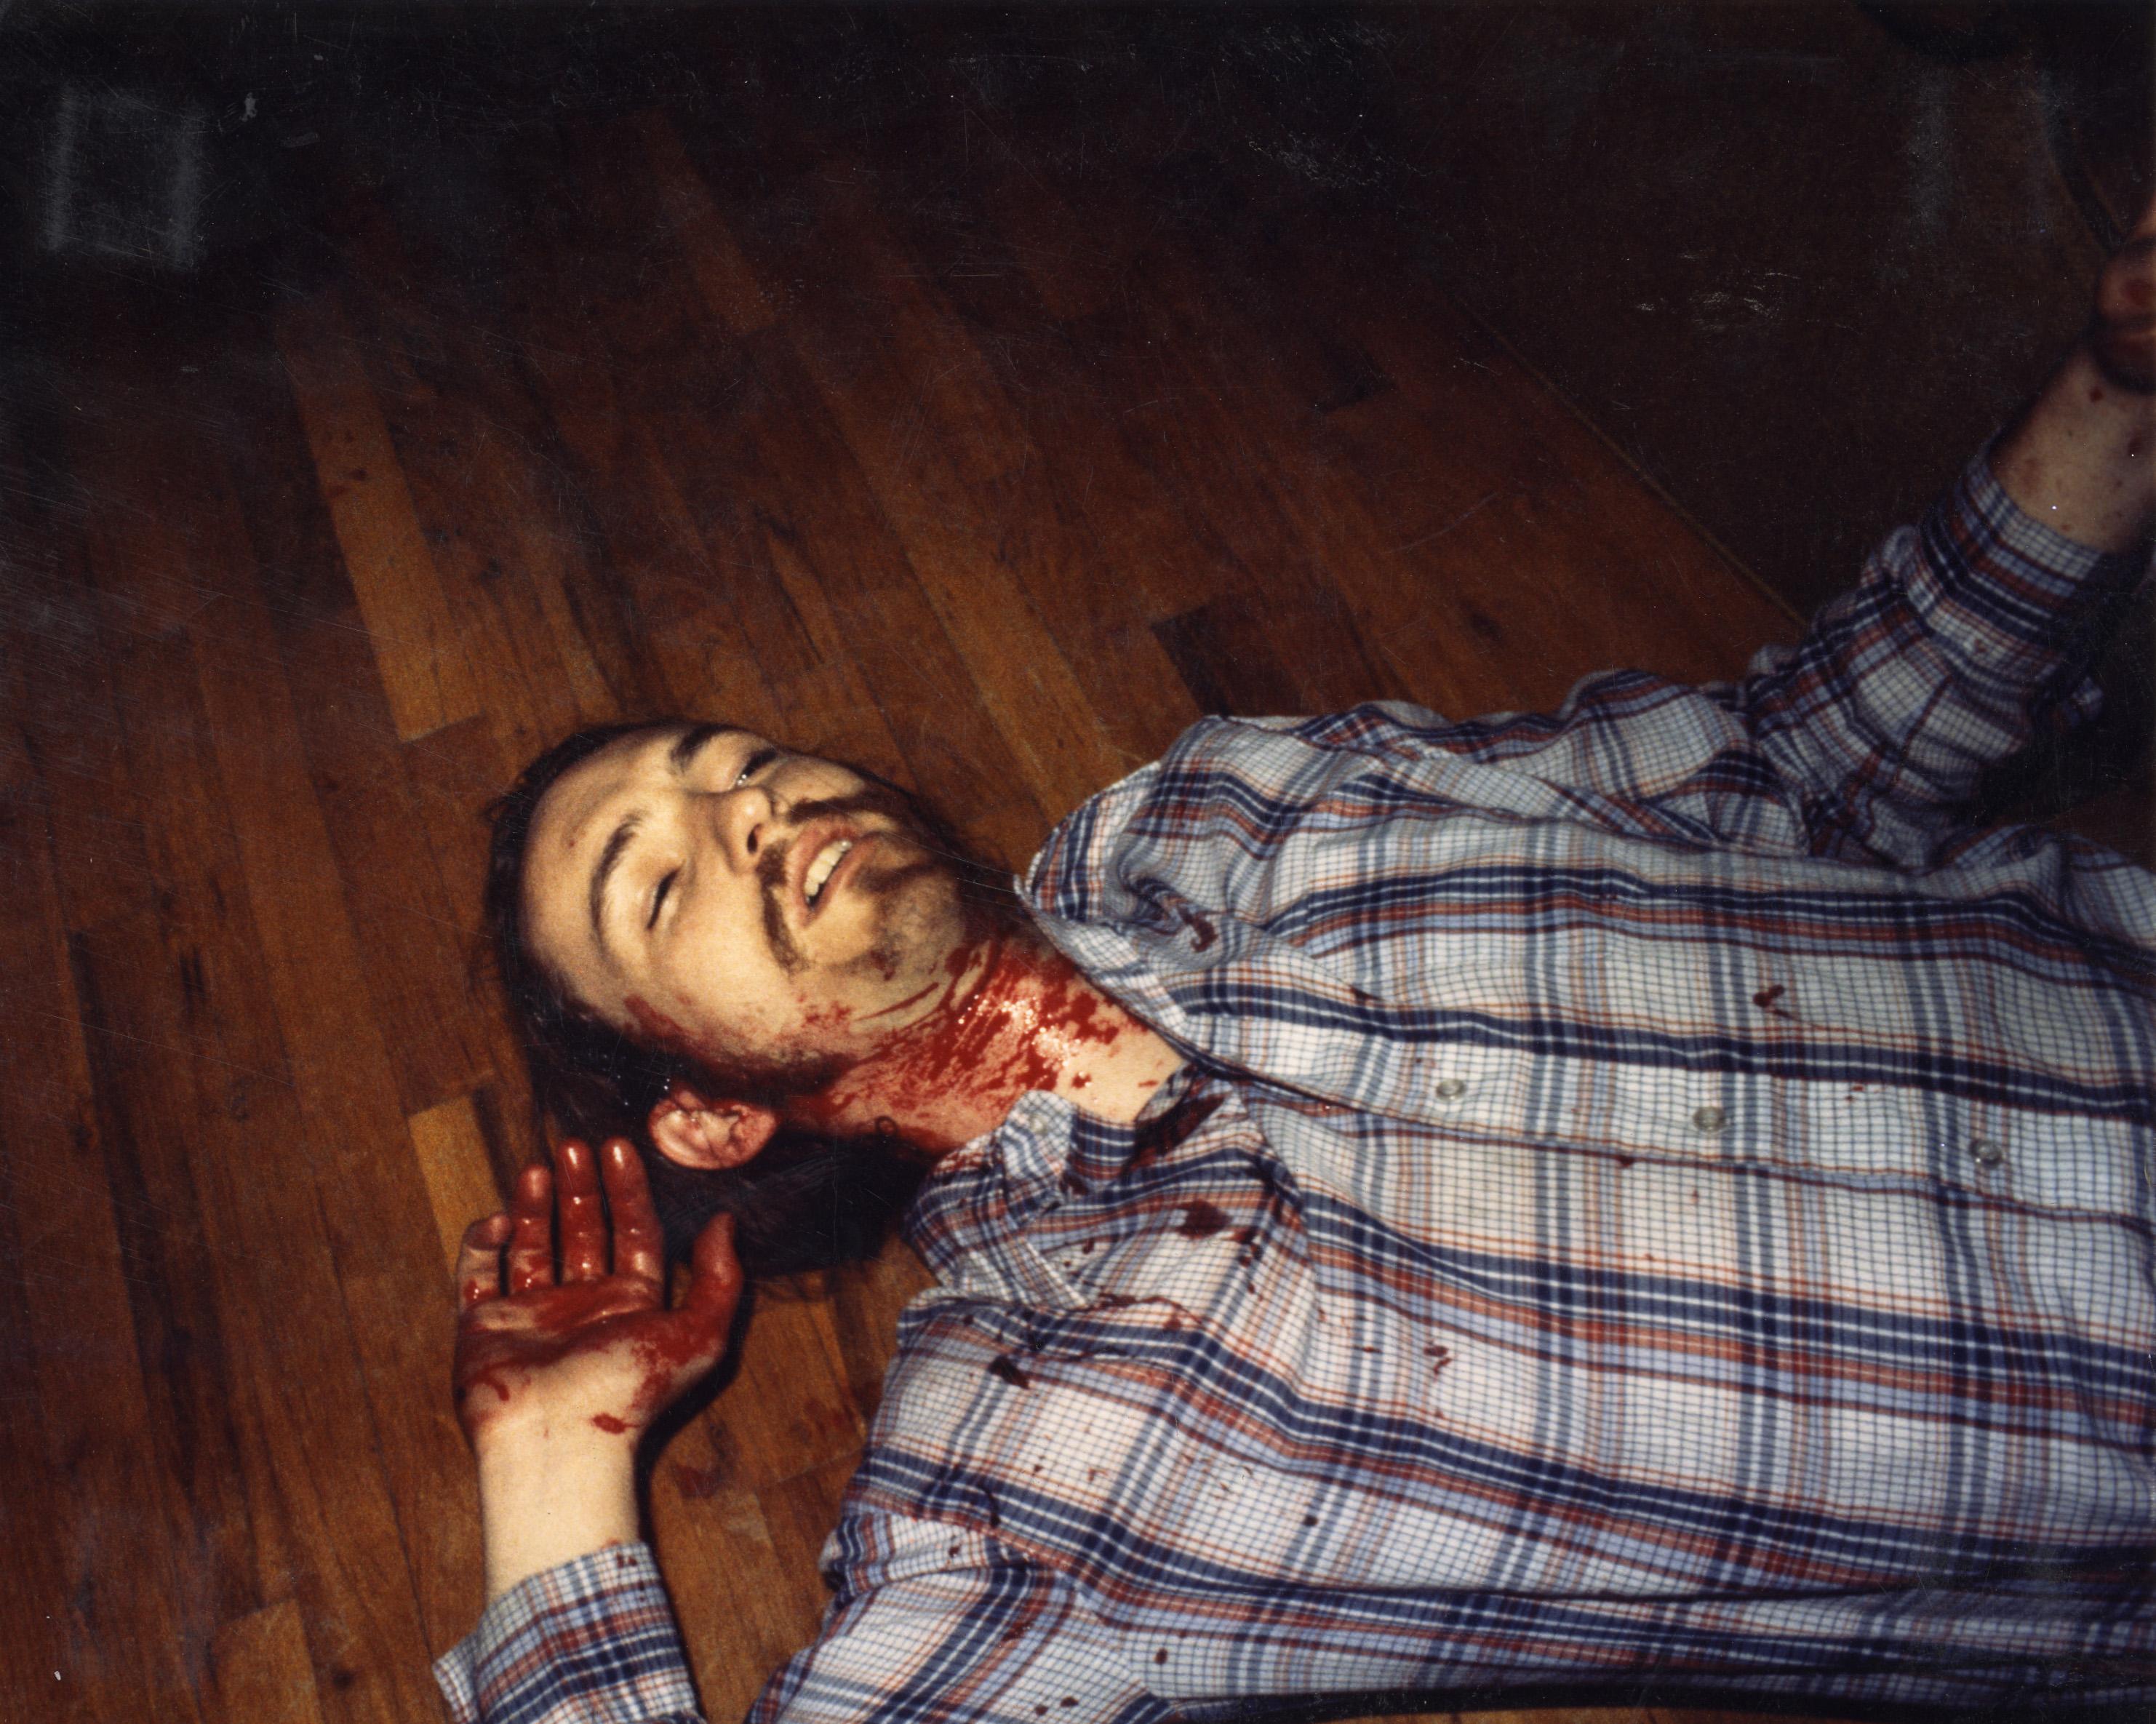 Shocking Crime Scene Photos America's